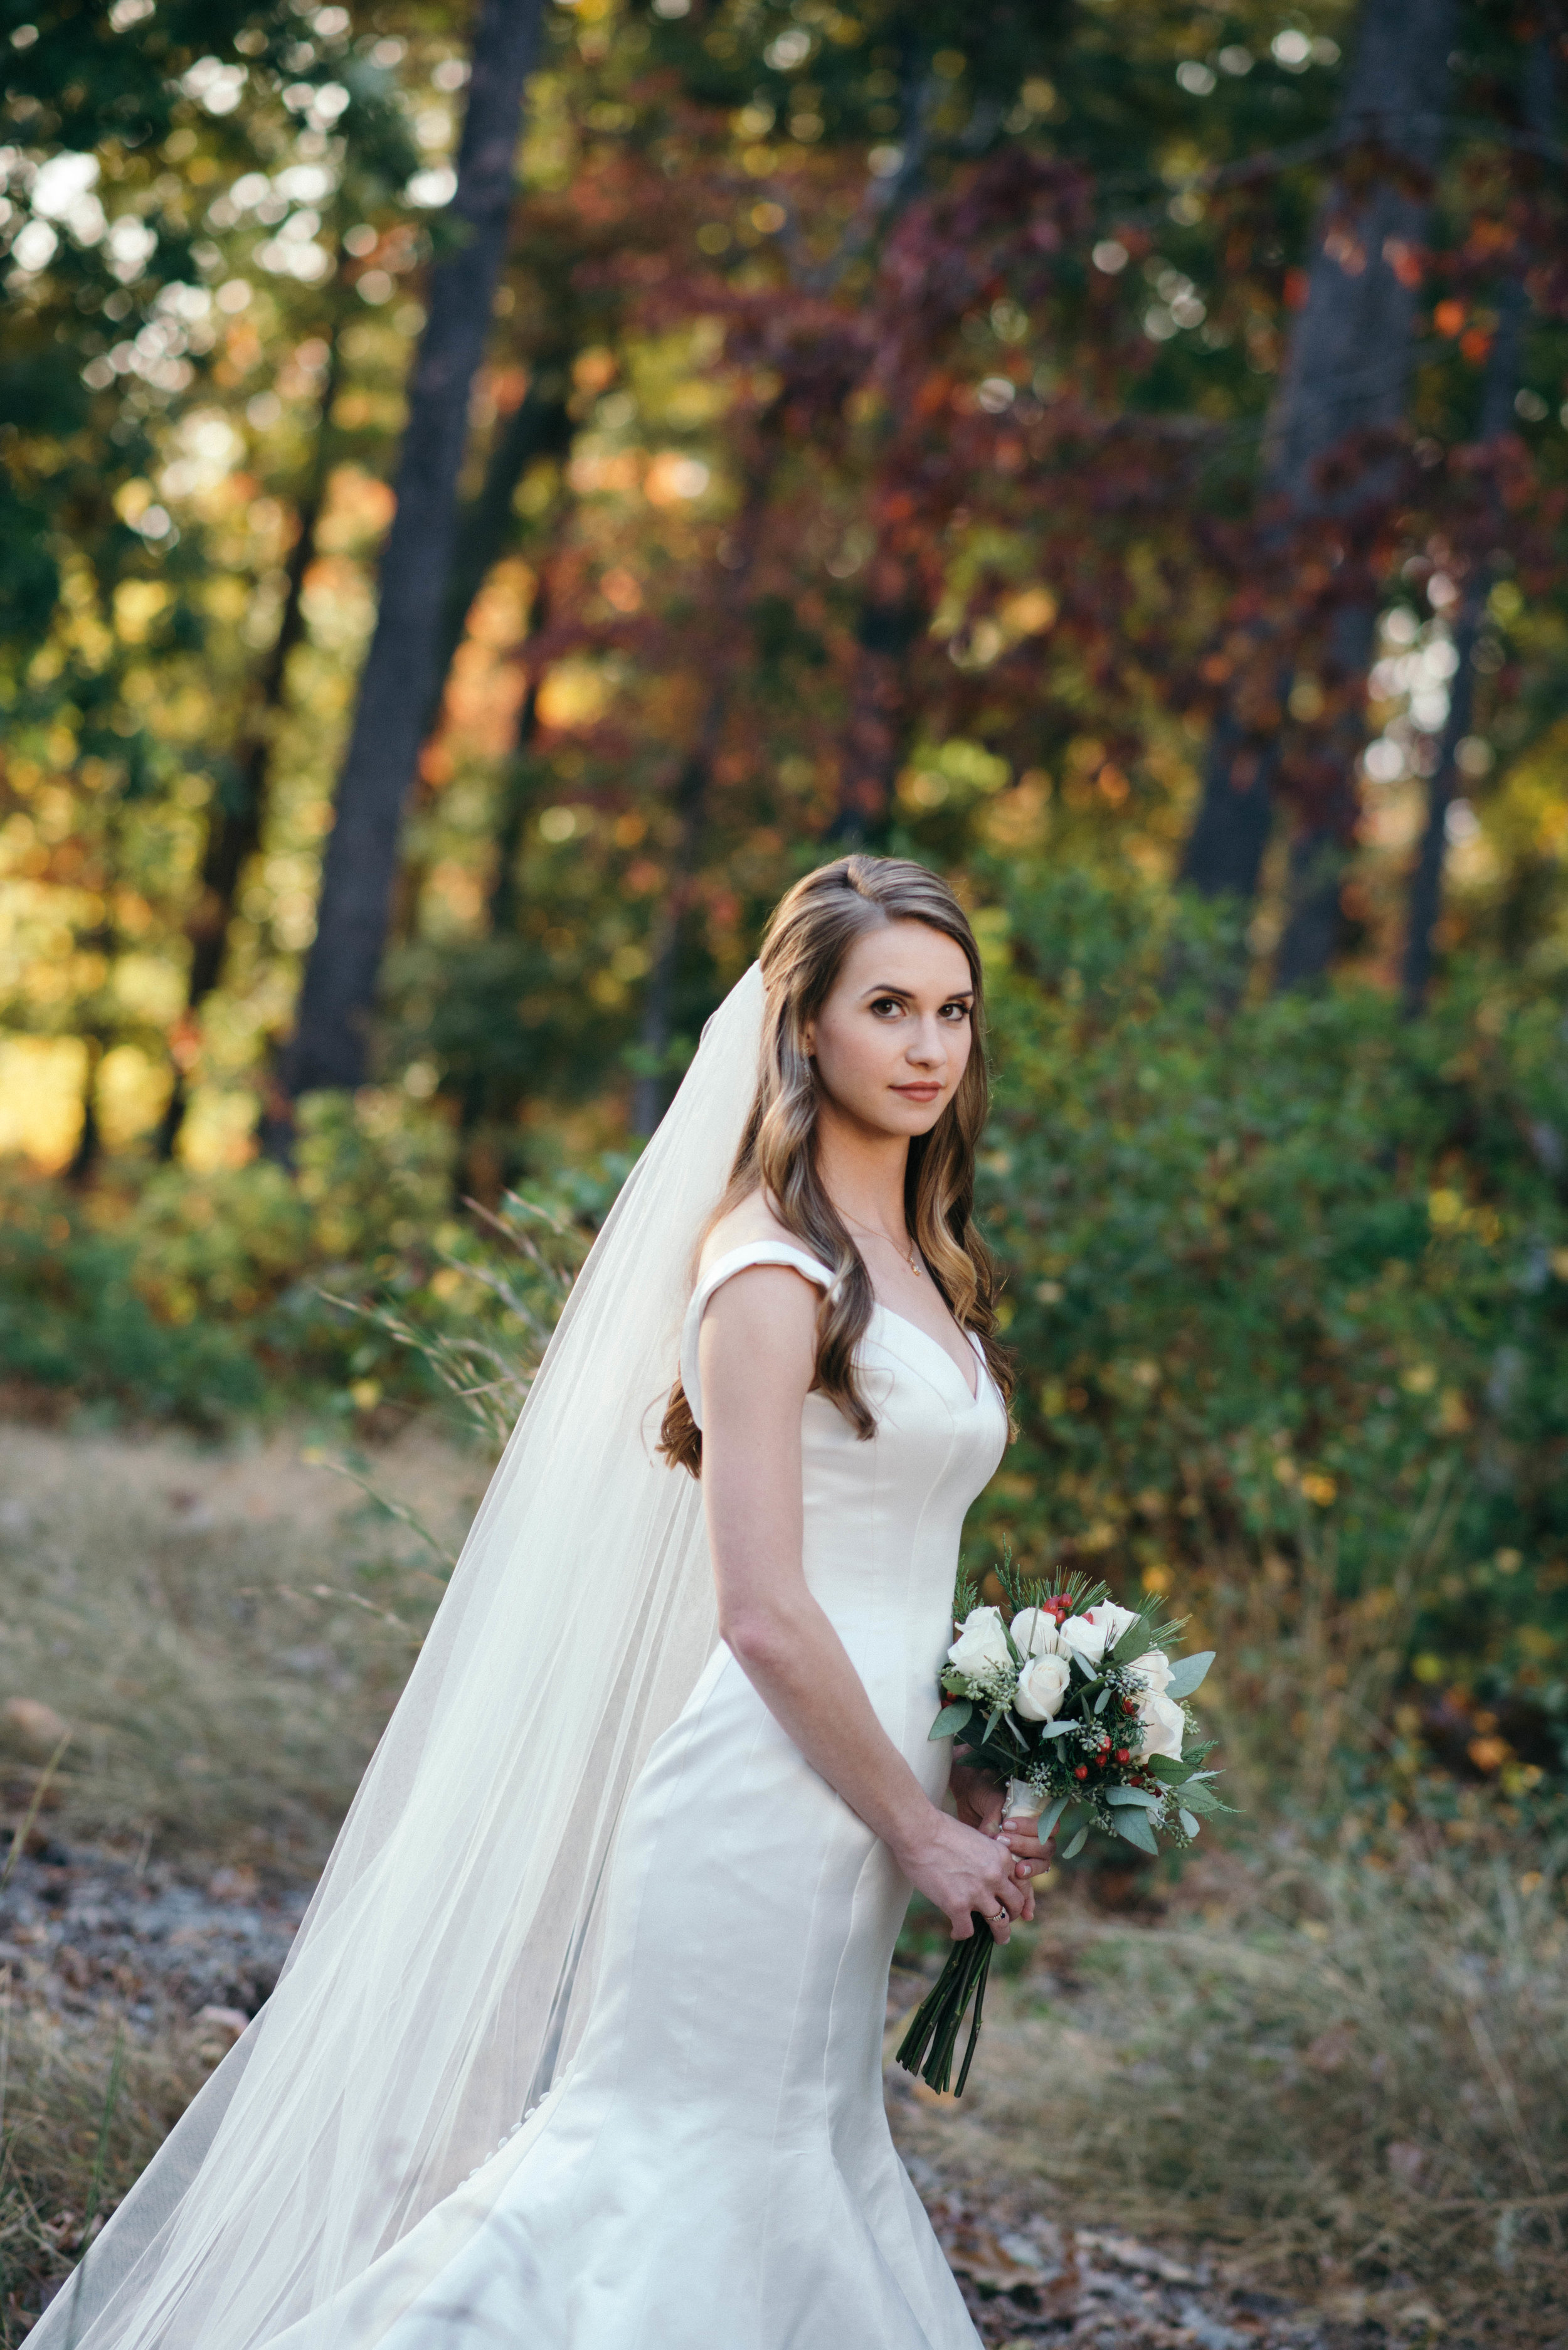 JuliaWilliams|Bridals|Color_MiraPhotographs-59.jpg